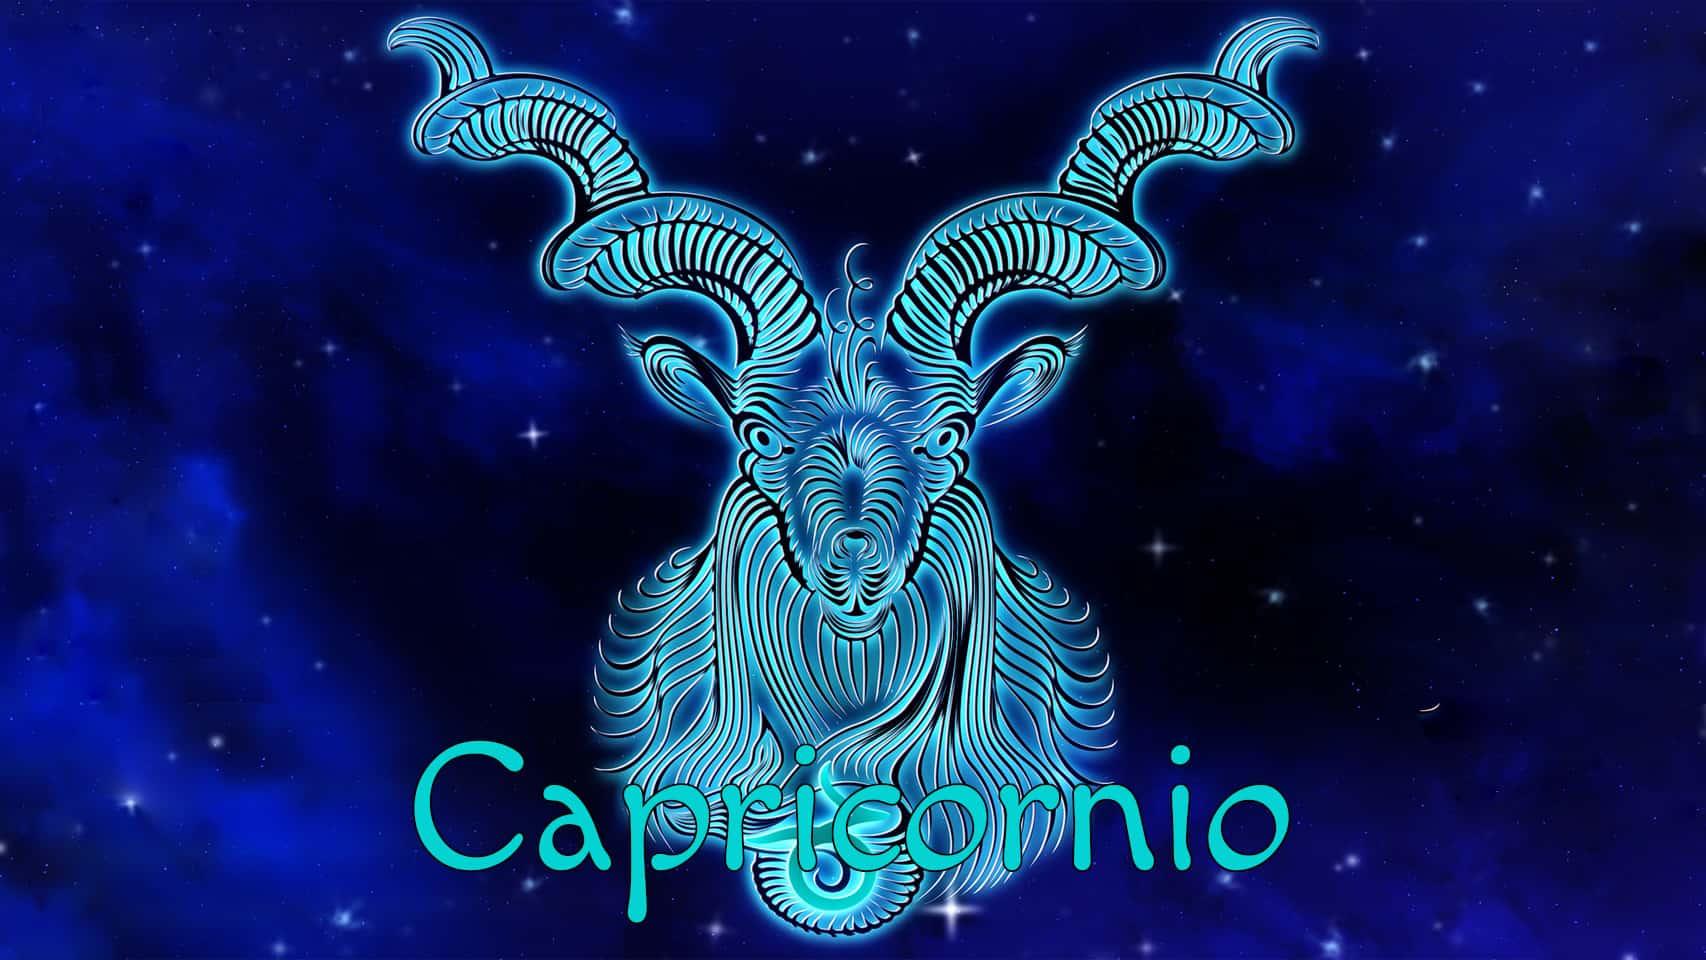 Horsocopo Capricornio